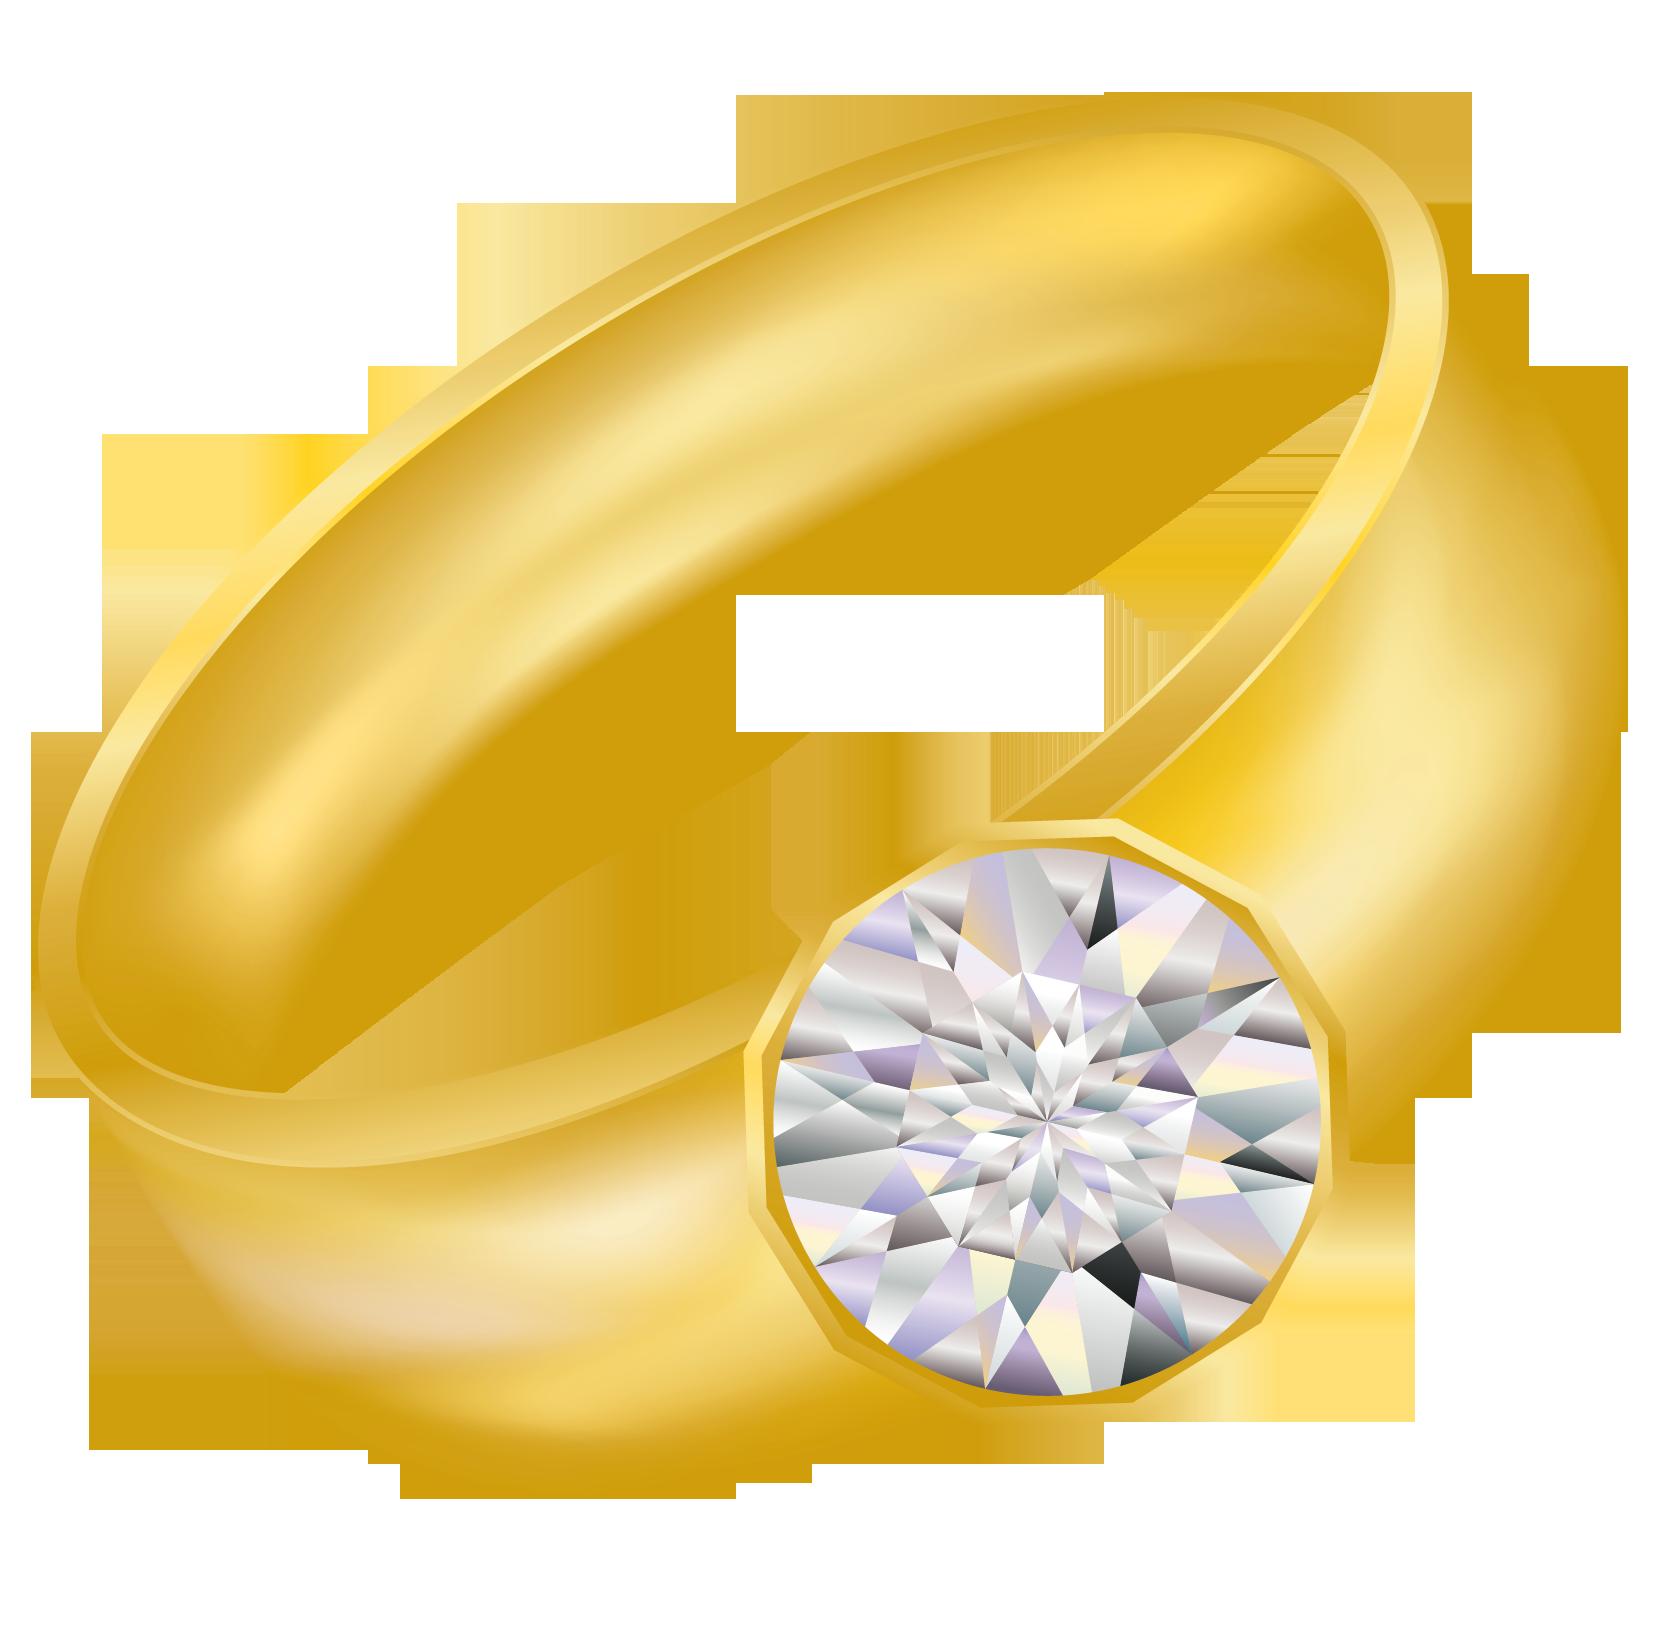 Diamond Ring Clip Art Free Clipart Image-Diamond ring clip art free clipart images 6 3-2